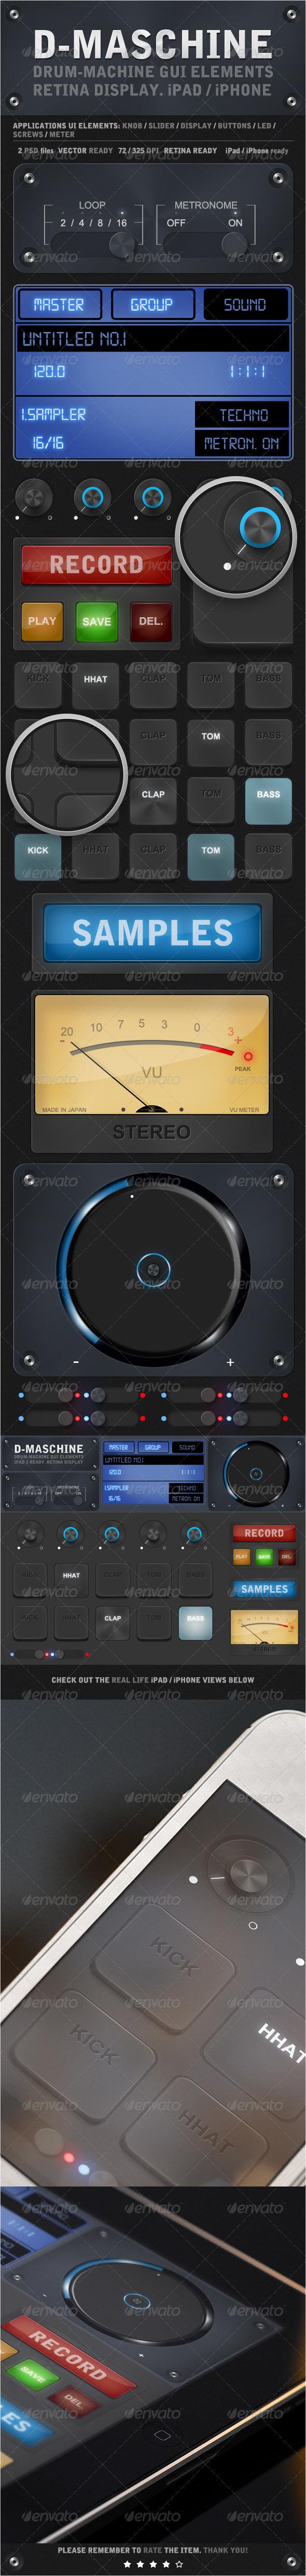 GraphicRiver D-Maschine iPad iPhone UI Elements V1 4113978